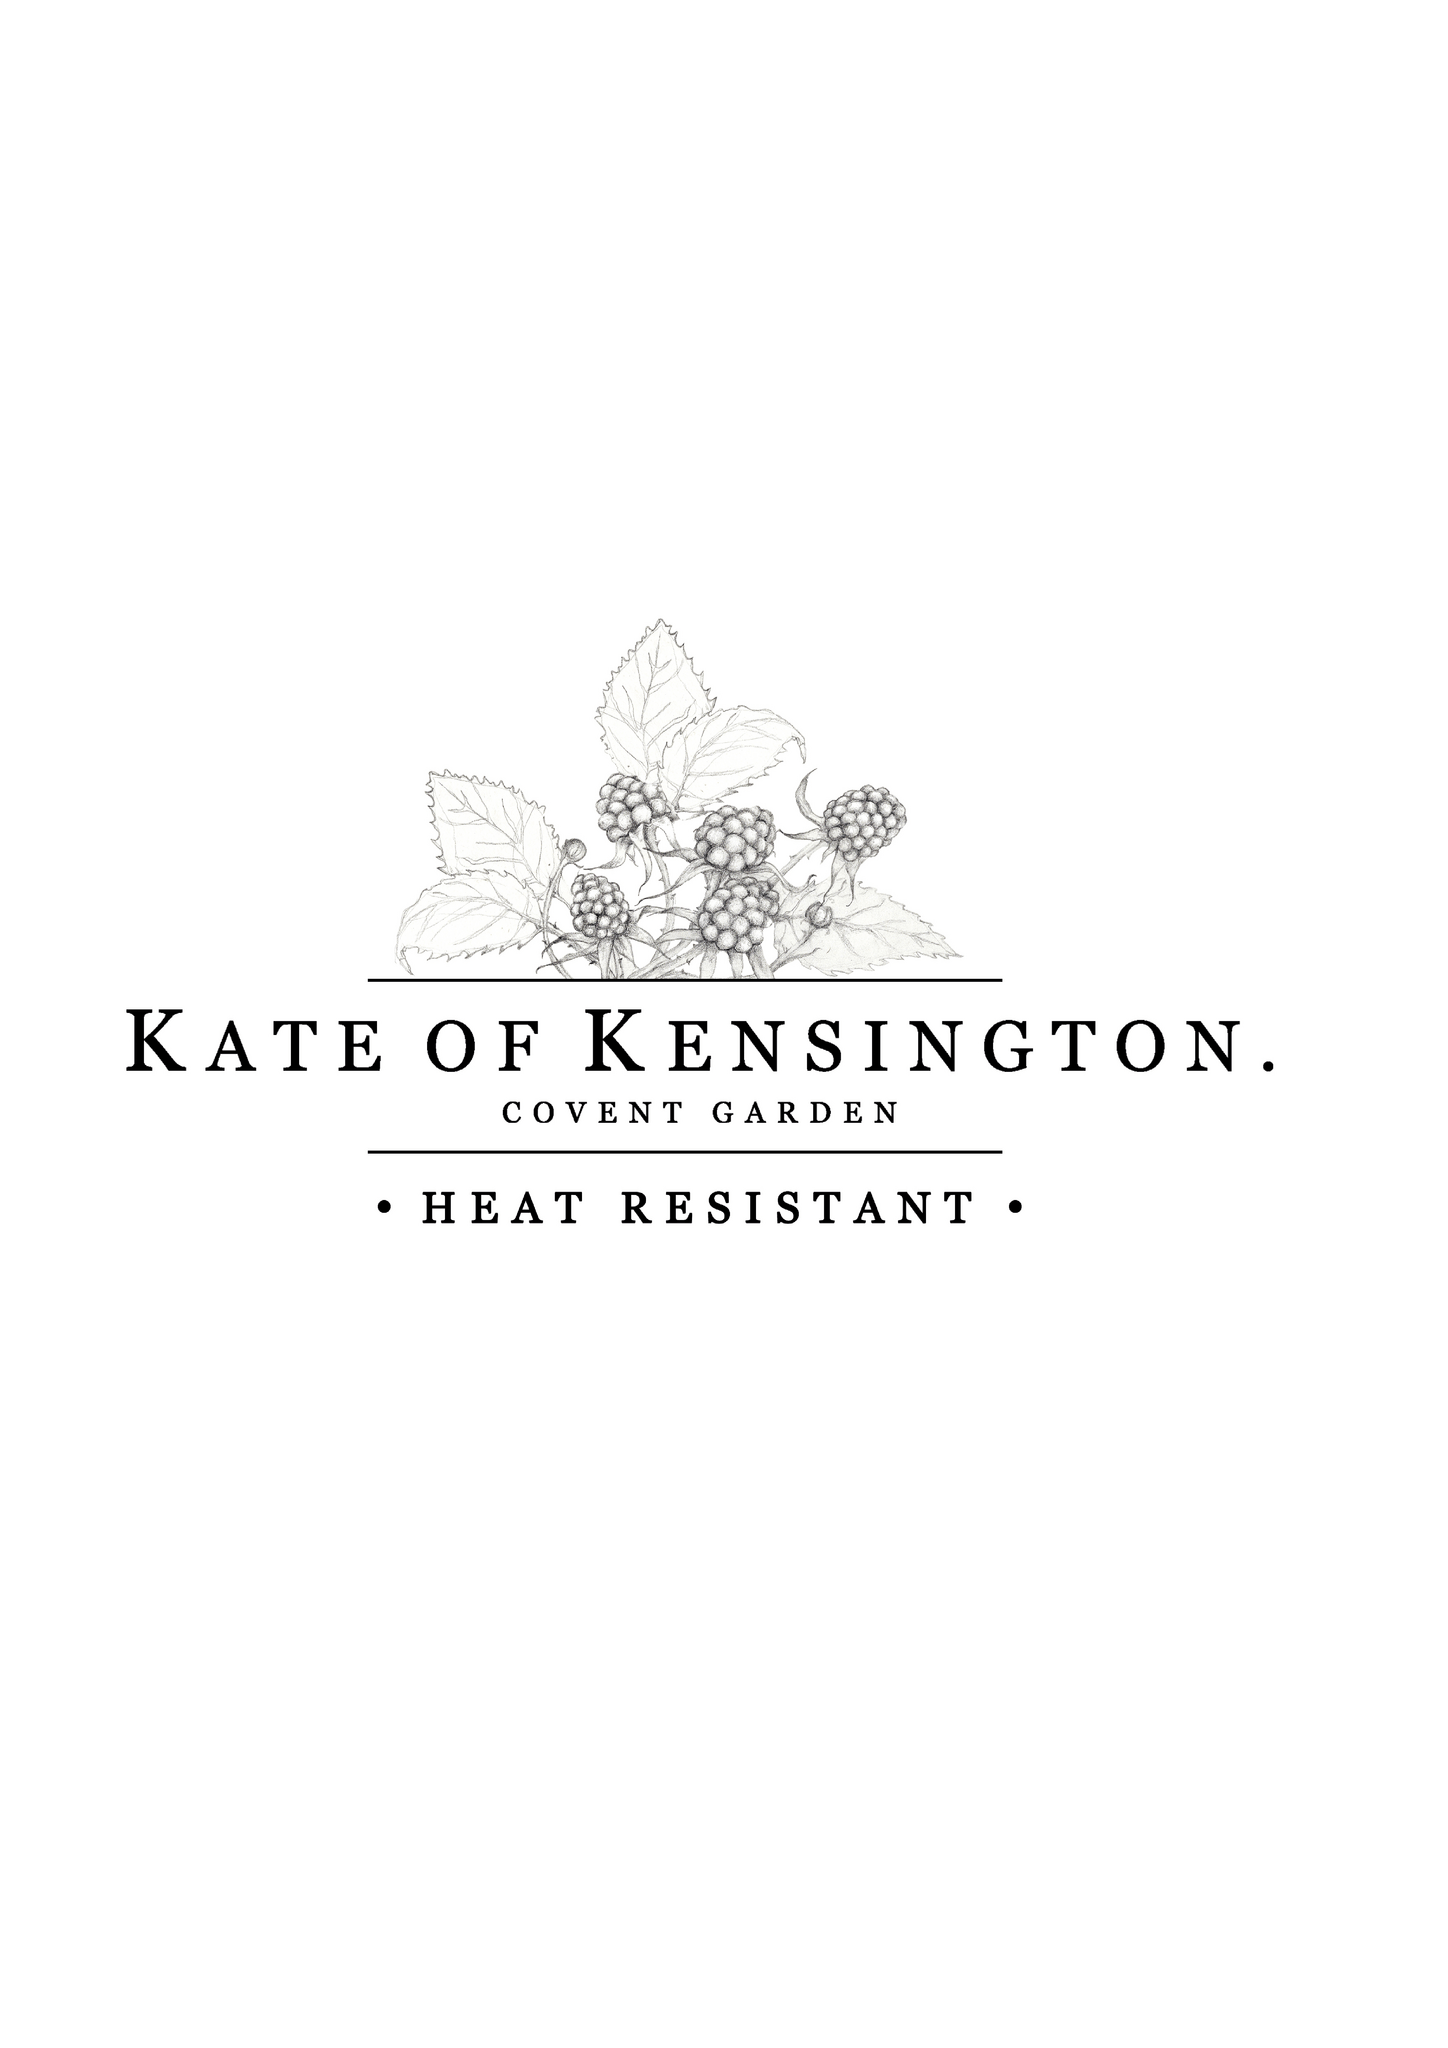 Kate of Kensington LTD